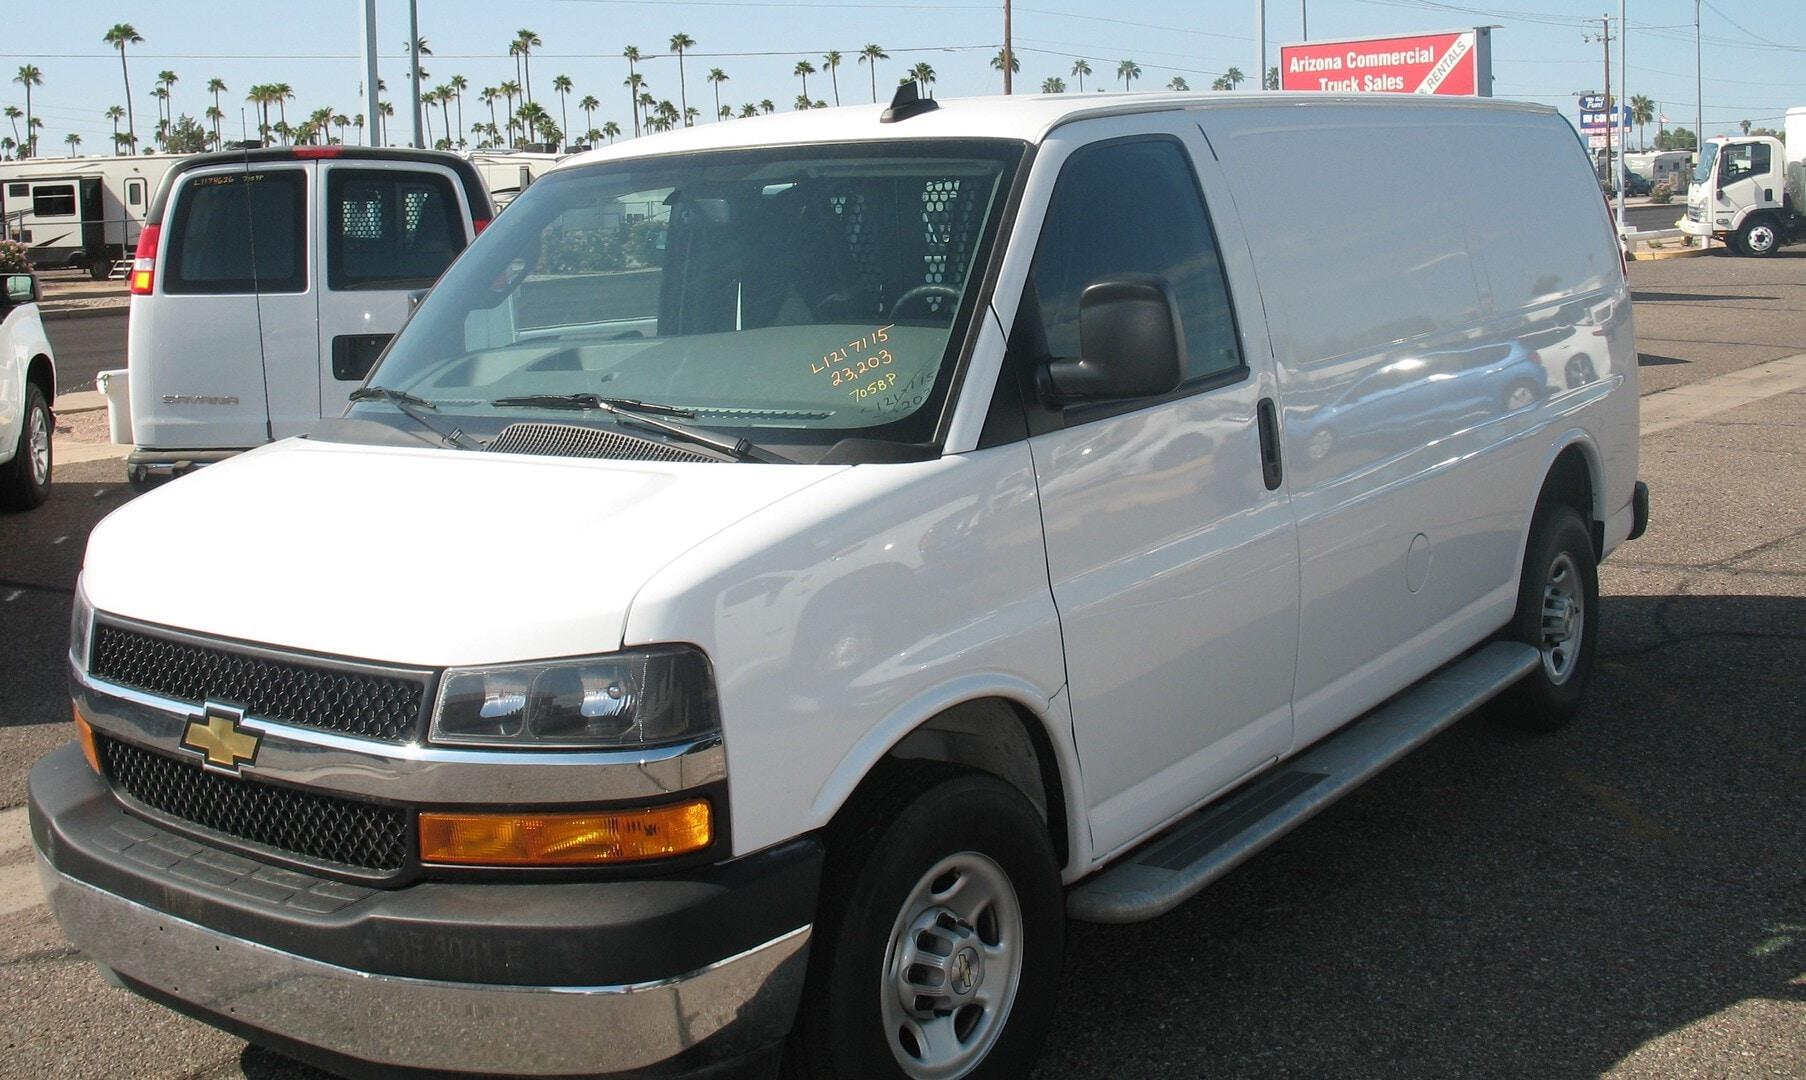 Used, 2020, Chevrolet, 2500 Express, Vans